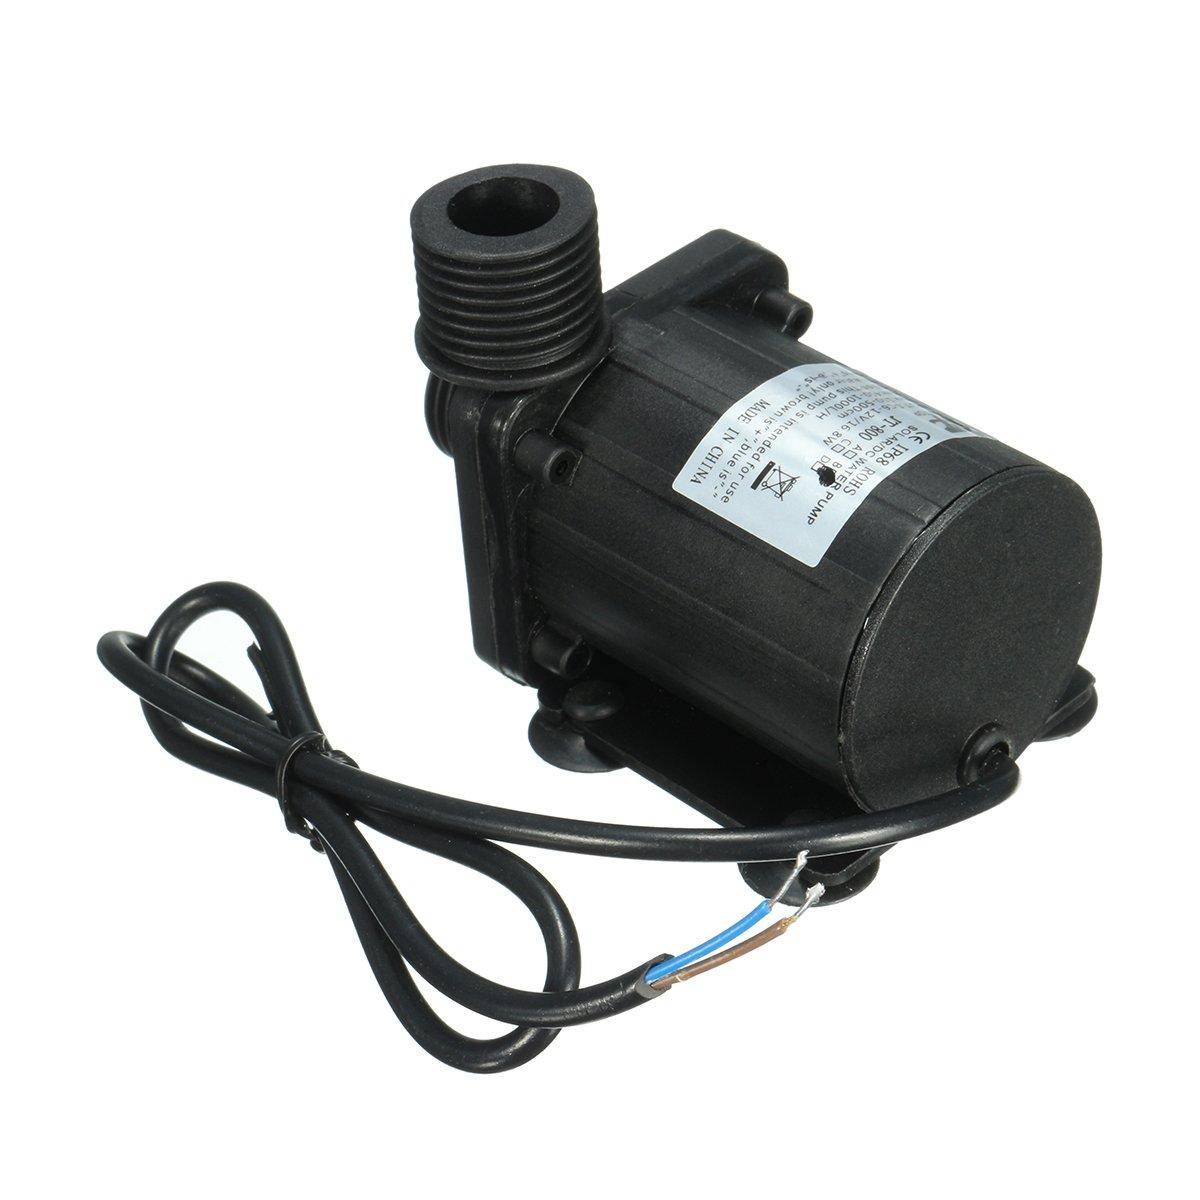 IP68 DC12V 5M 800L/H Ultra Quiet Brushless Motor Submersible Pool Water Pump